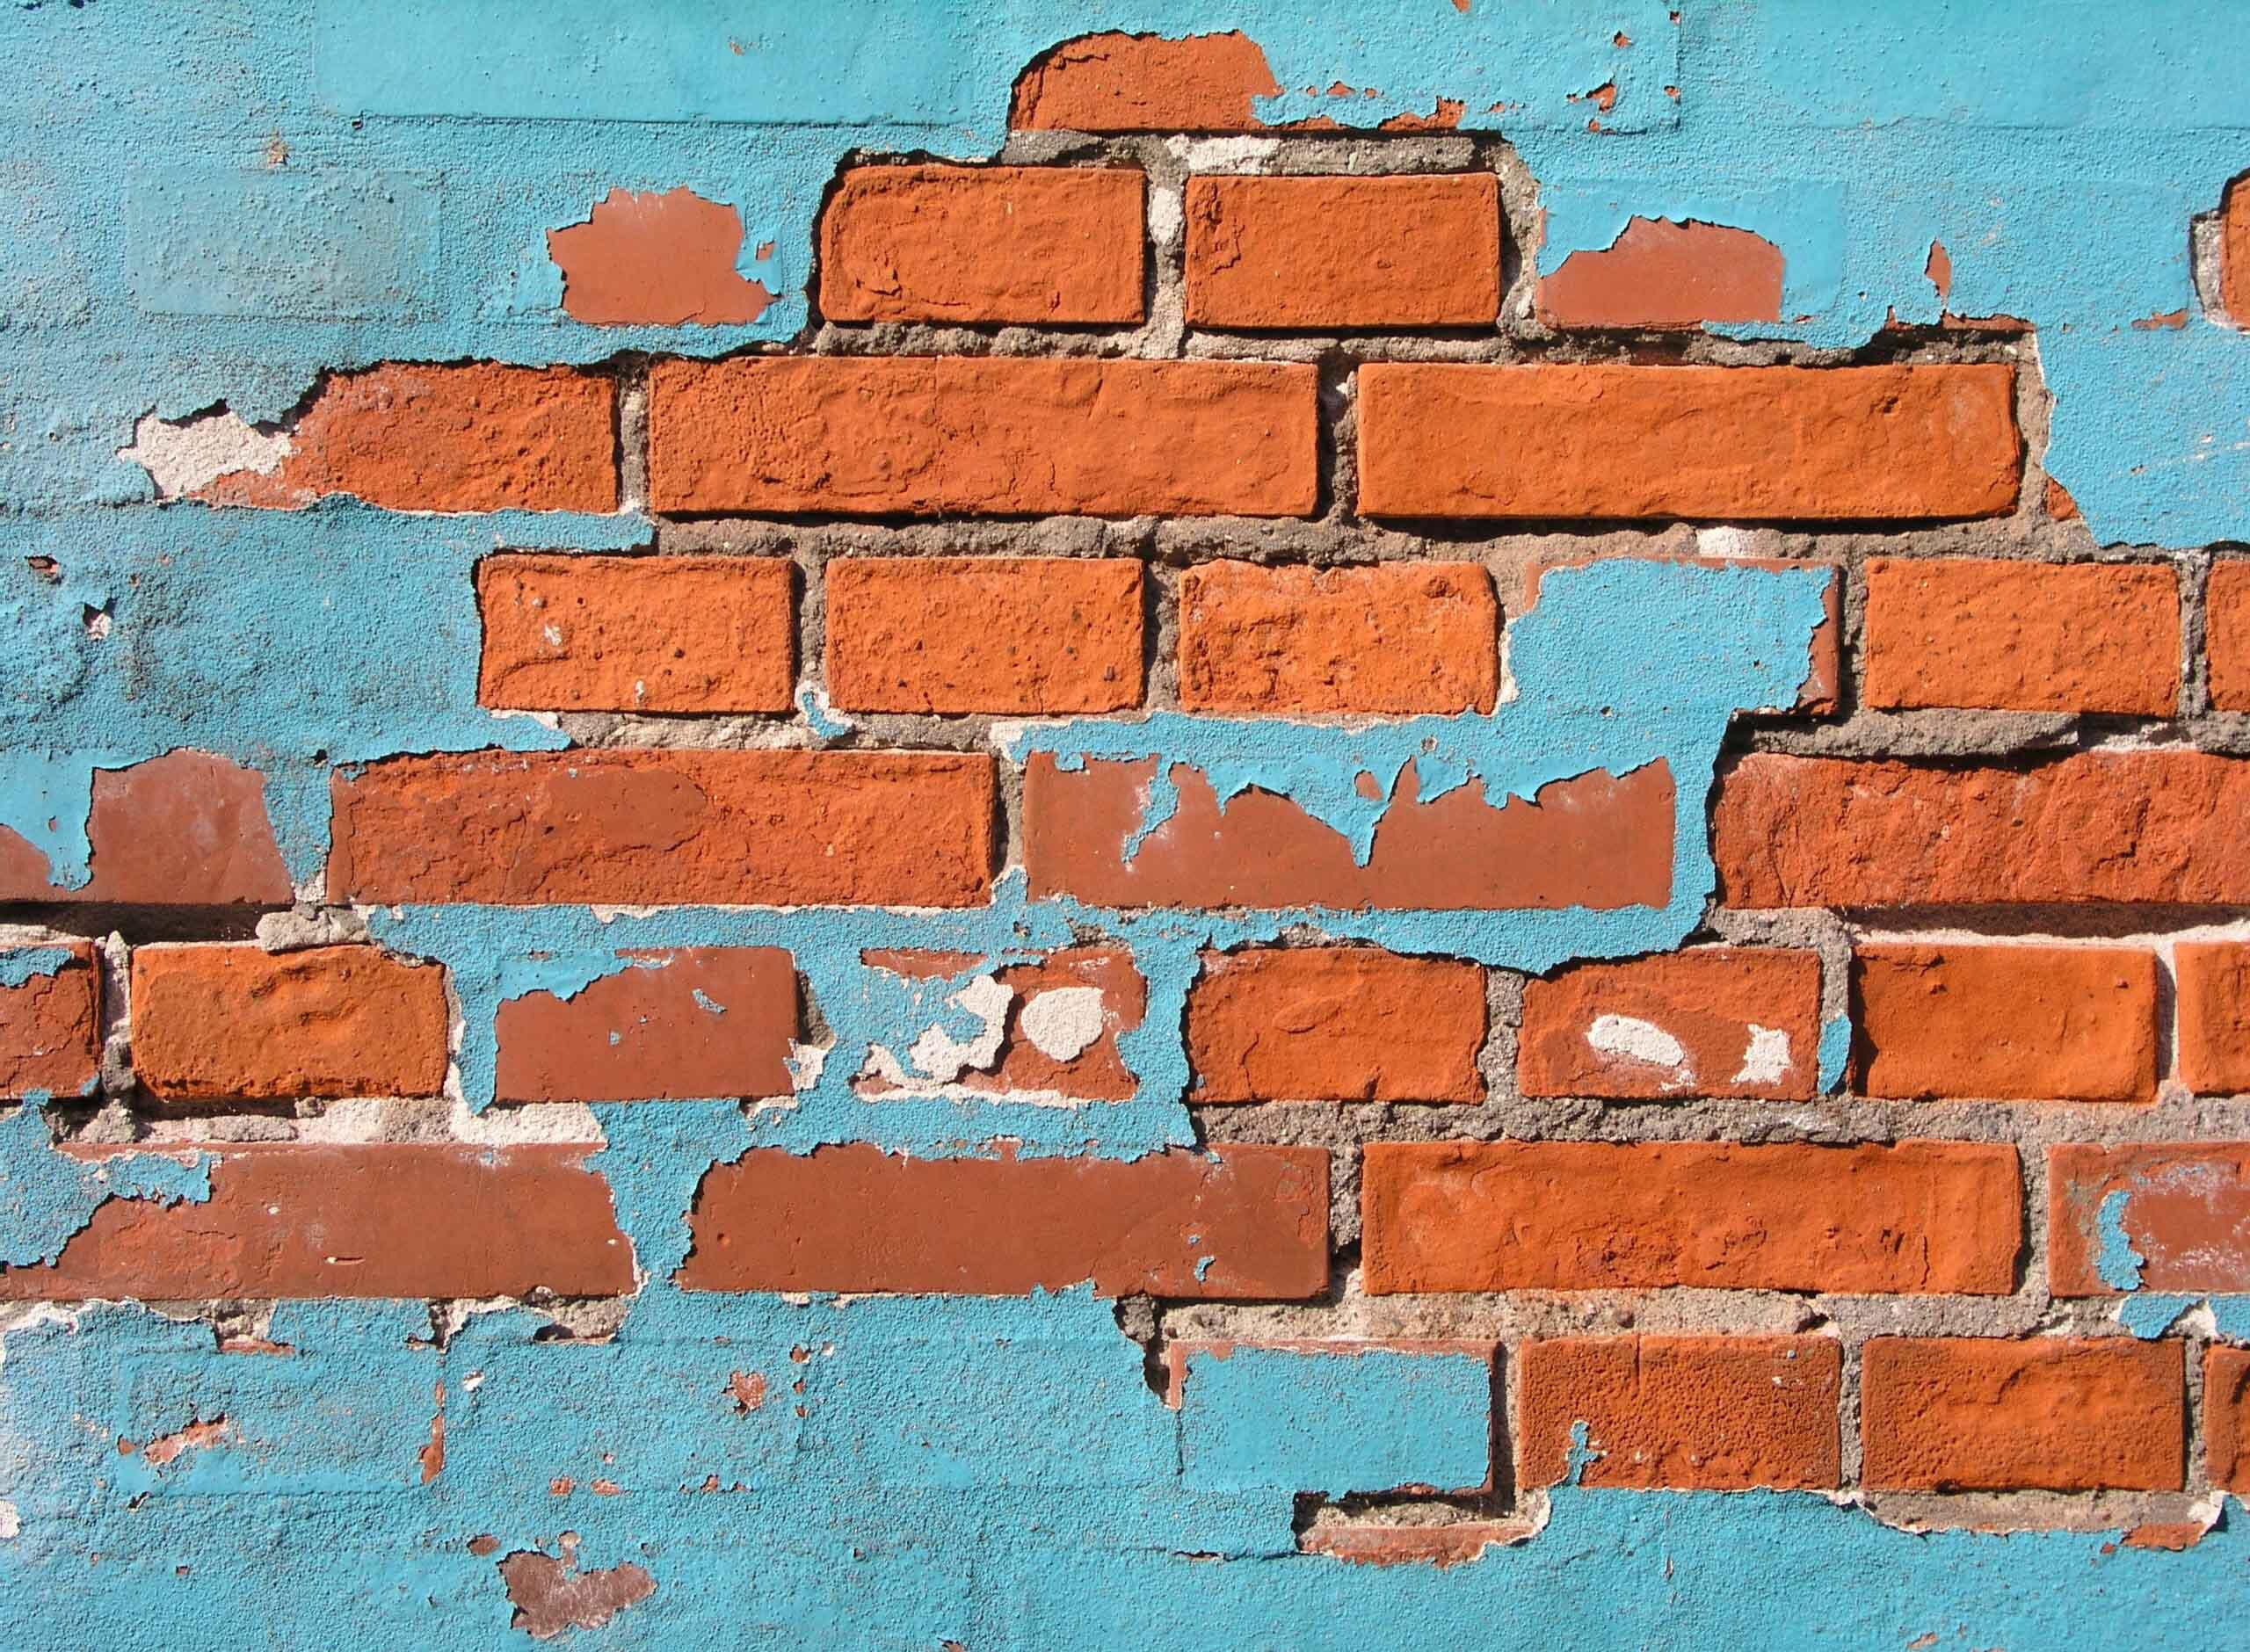 Duvara karşı: Başika'dan dönüş